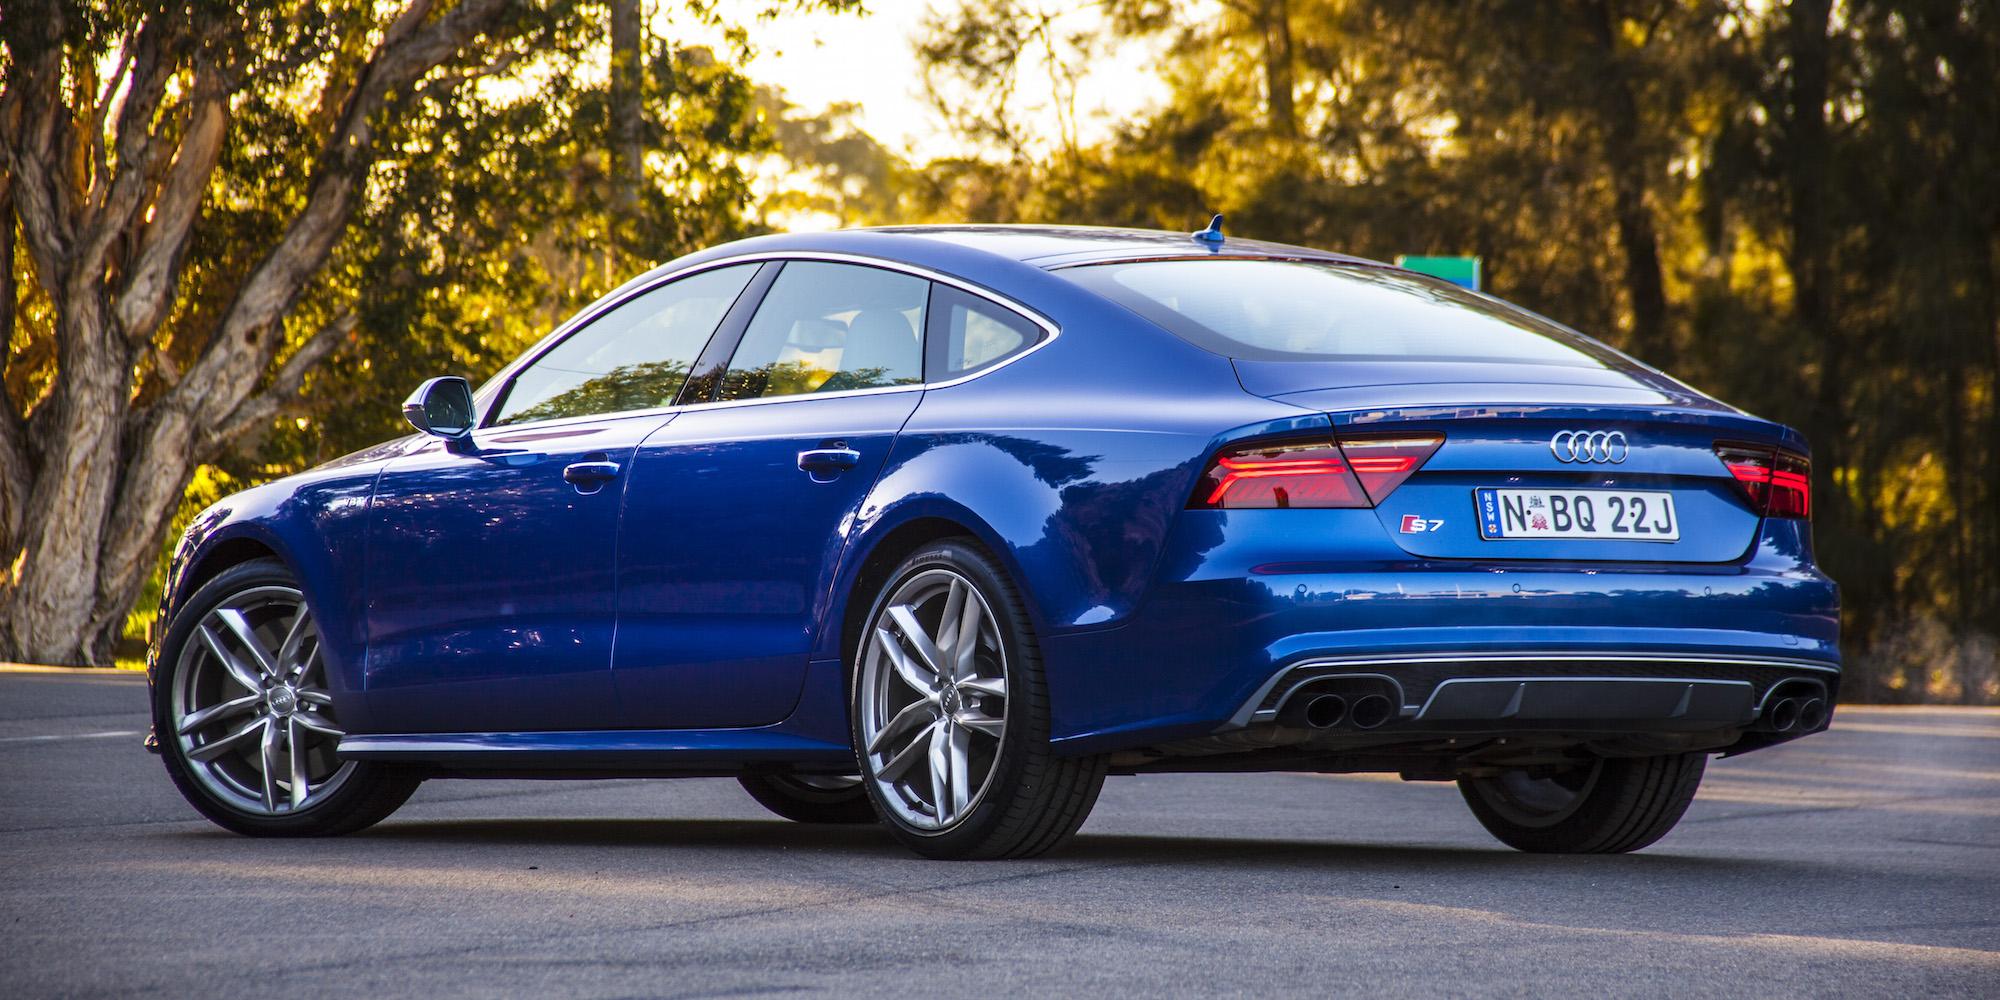 Audi Q5 Specs >> 2015 Audi S7 Sportback Review | CarAdvice